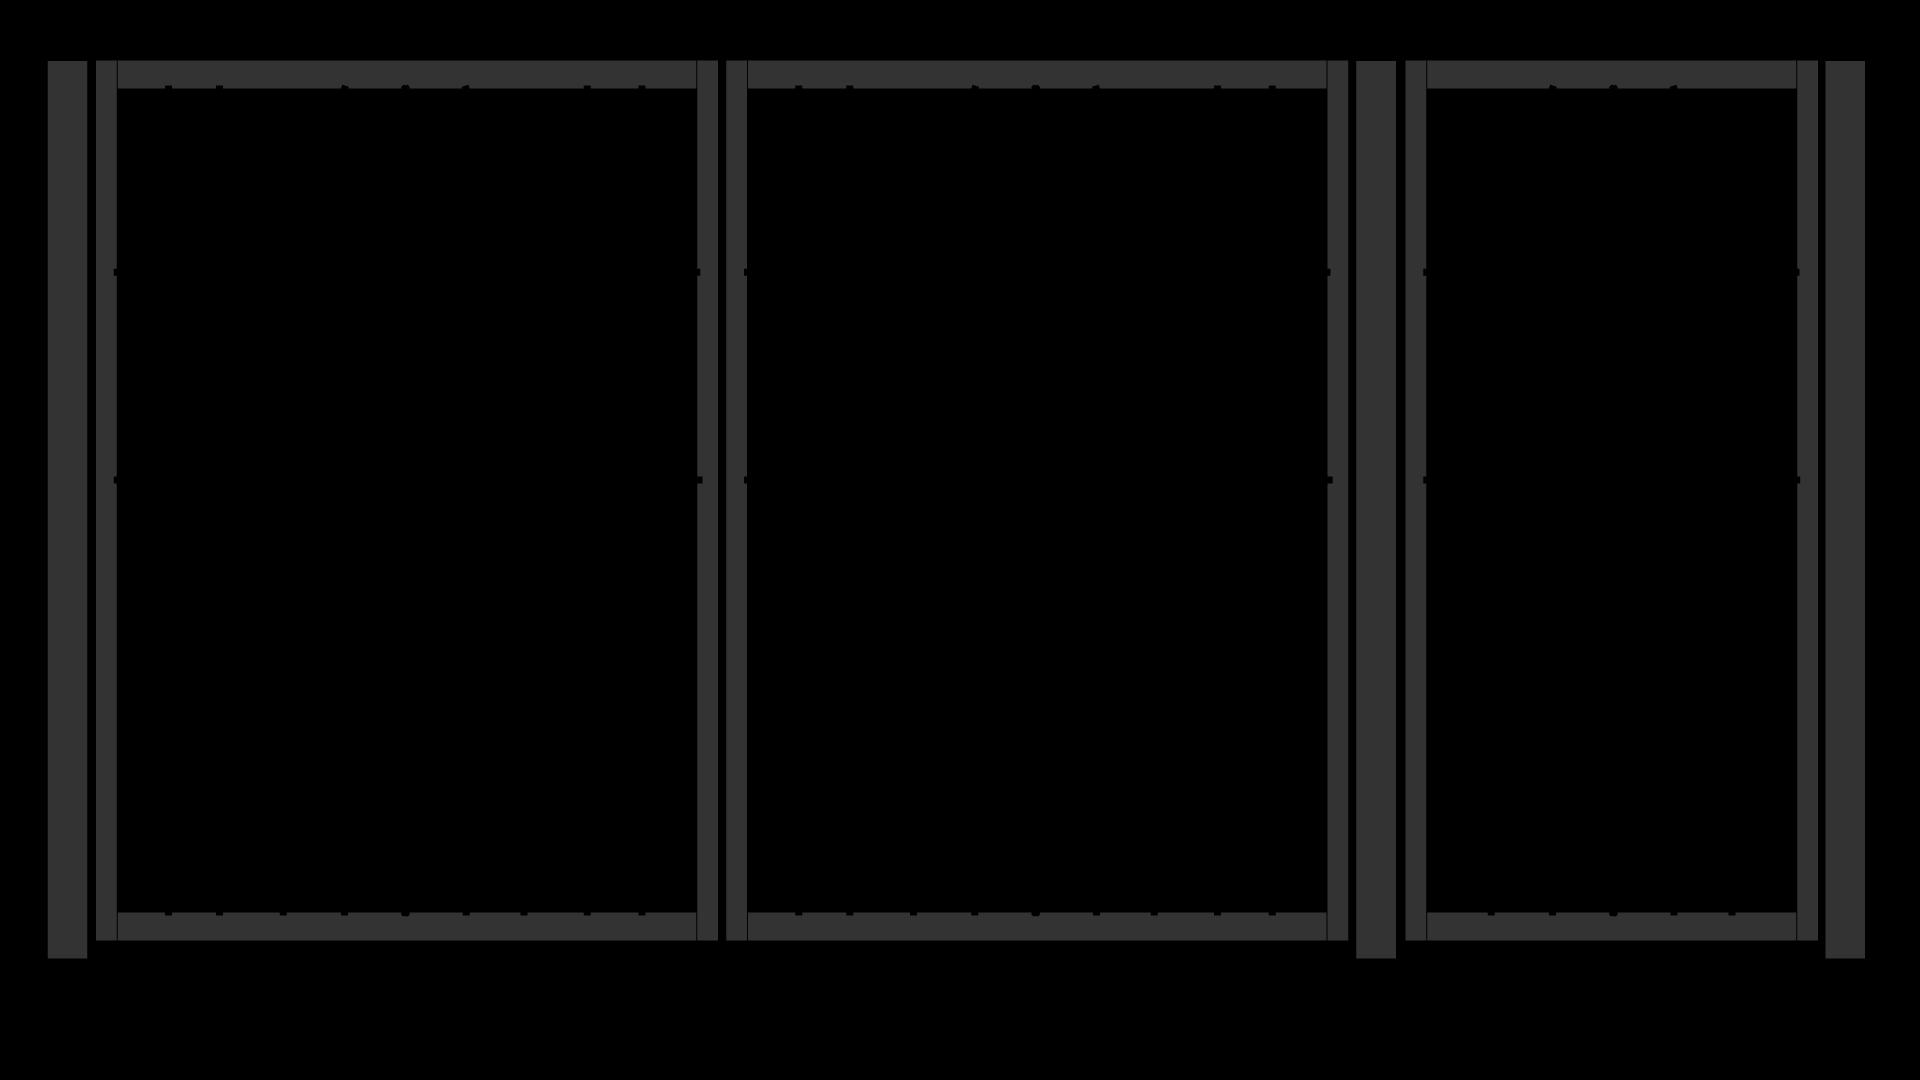 Gate clipart metal bar. Image result for art